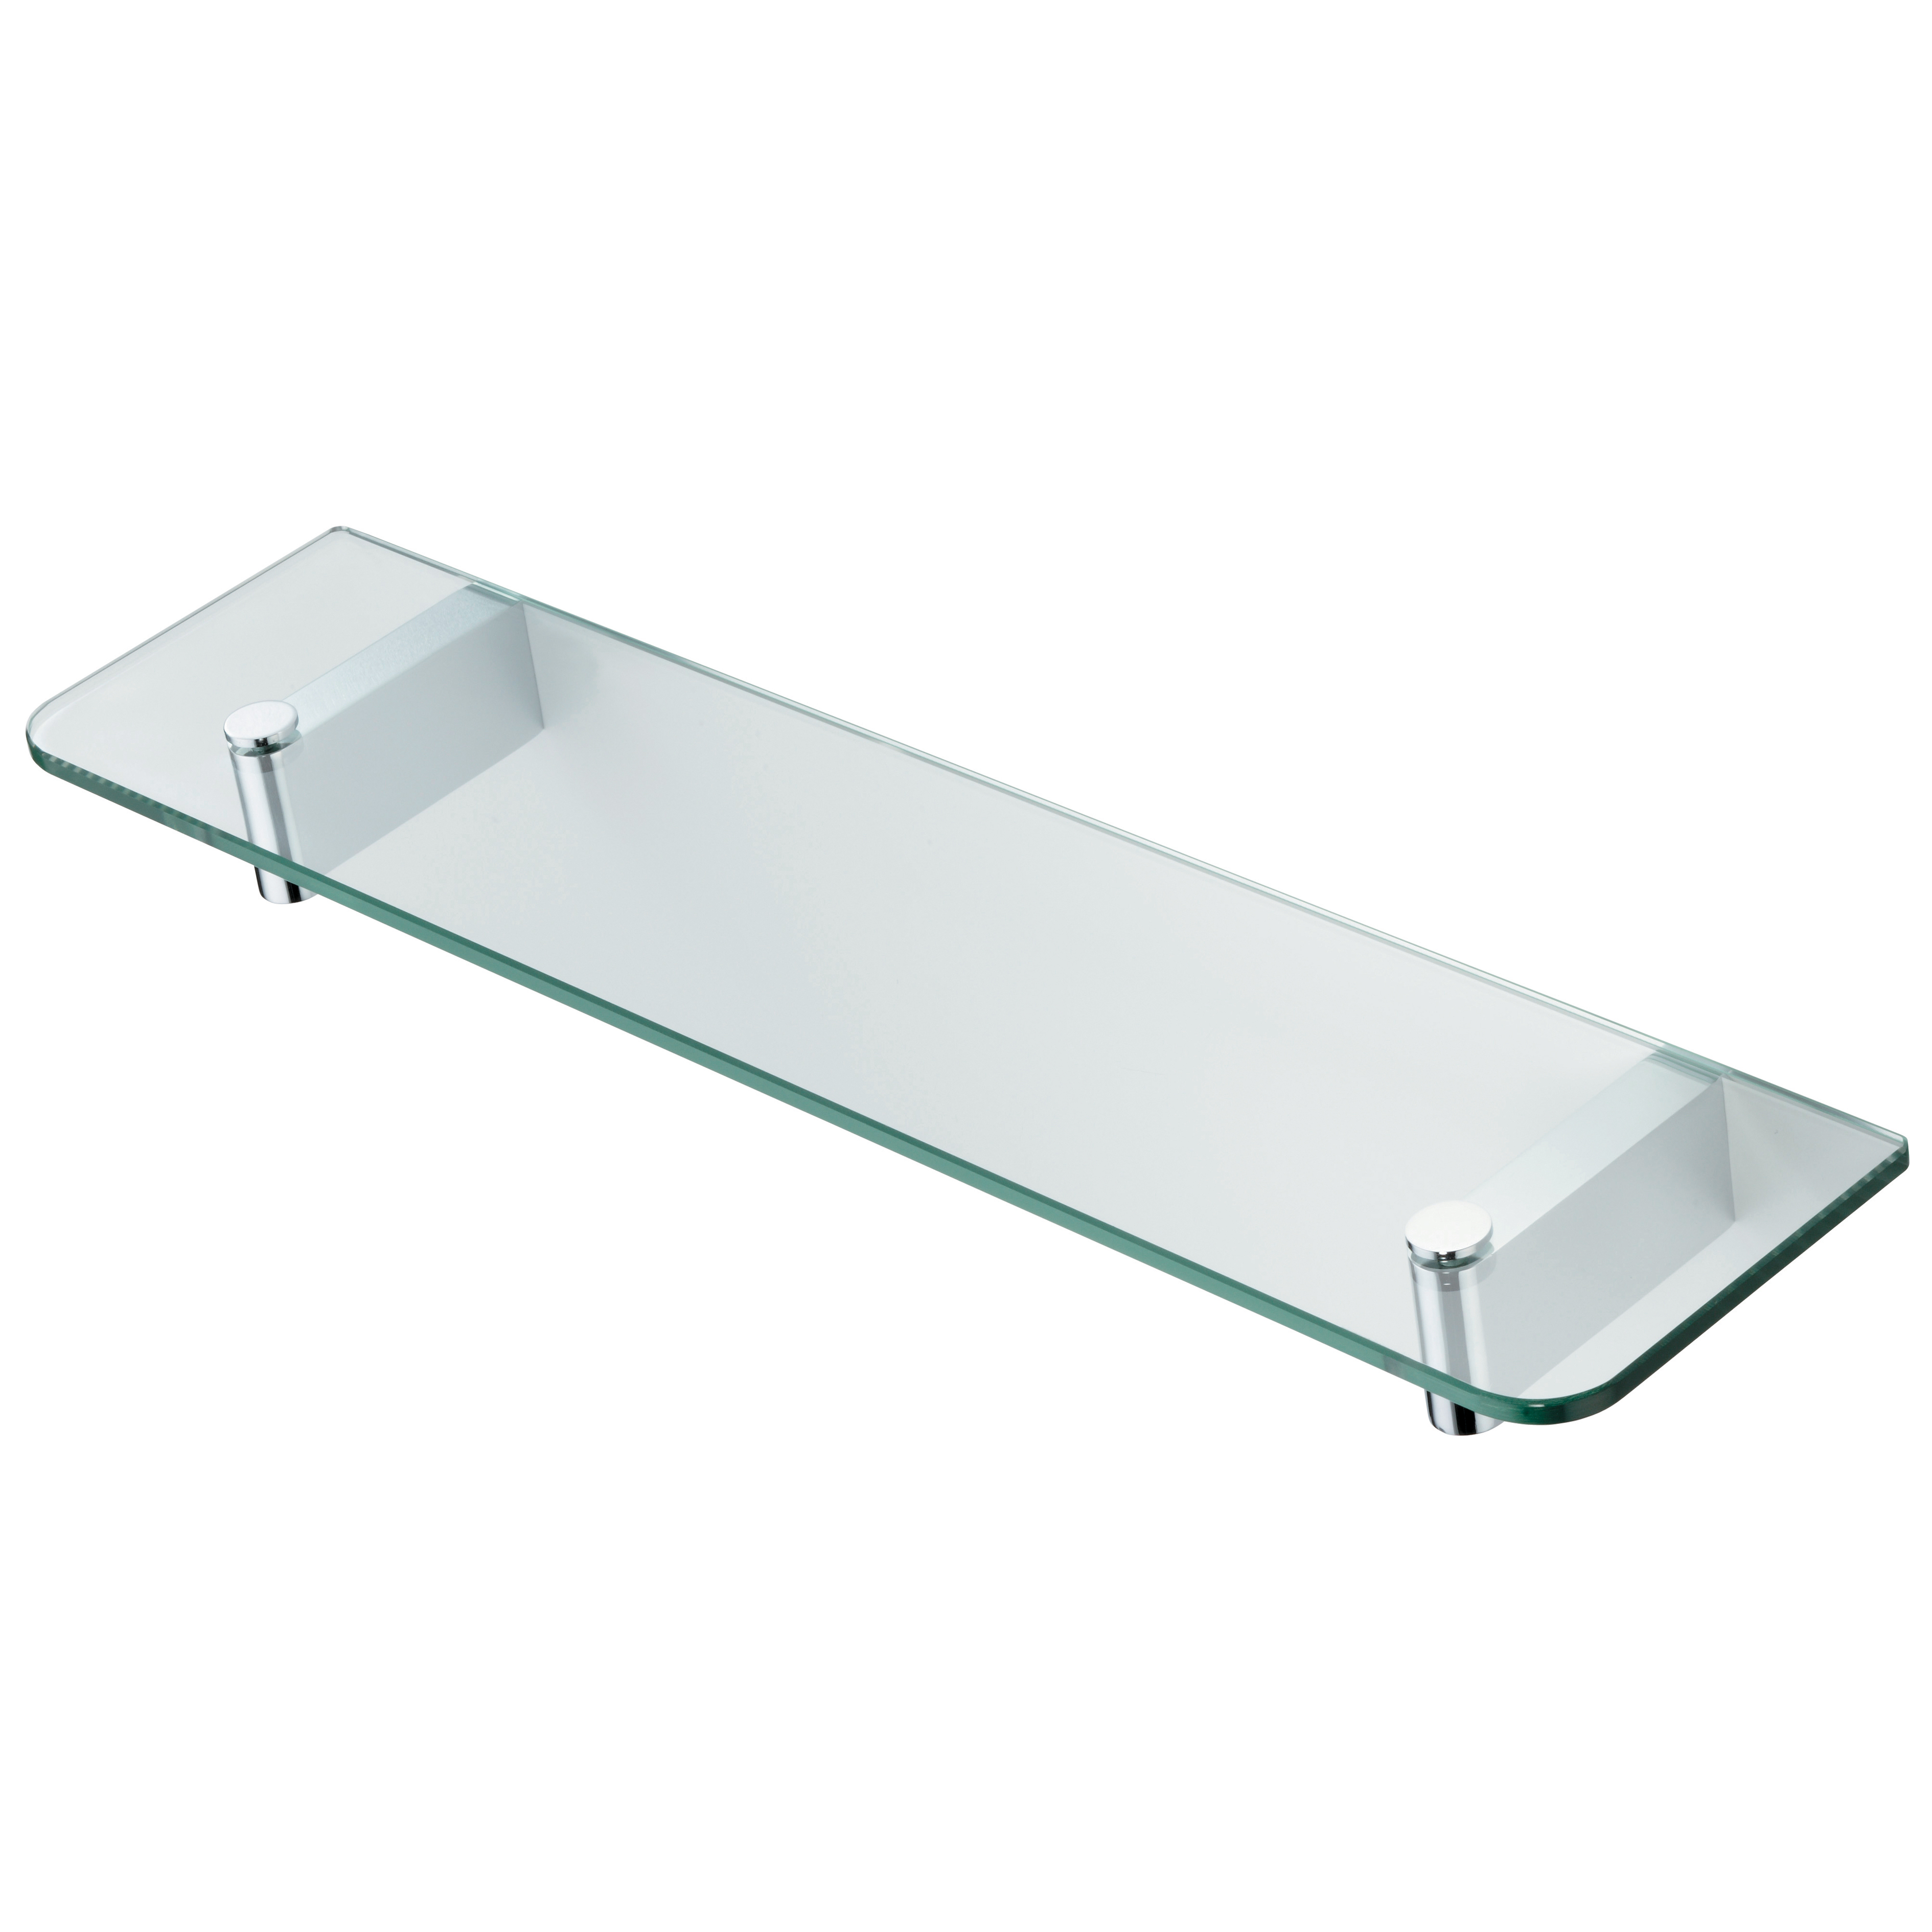 Concept 500mm Glass Shelf Concept Accessories Bluebook